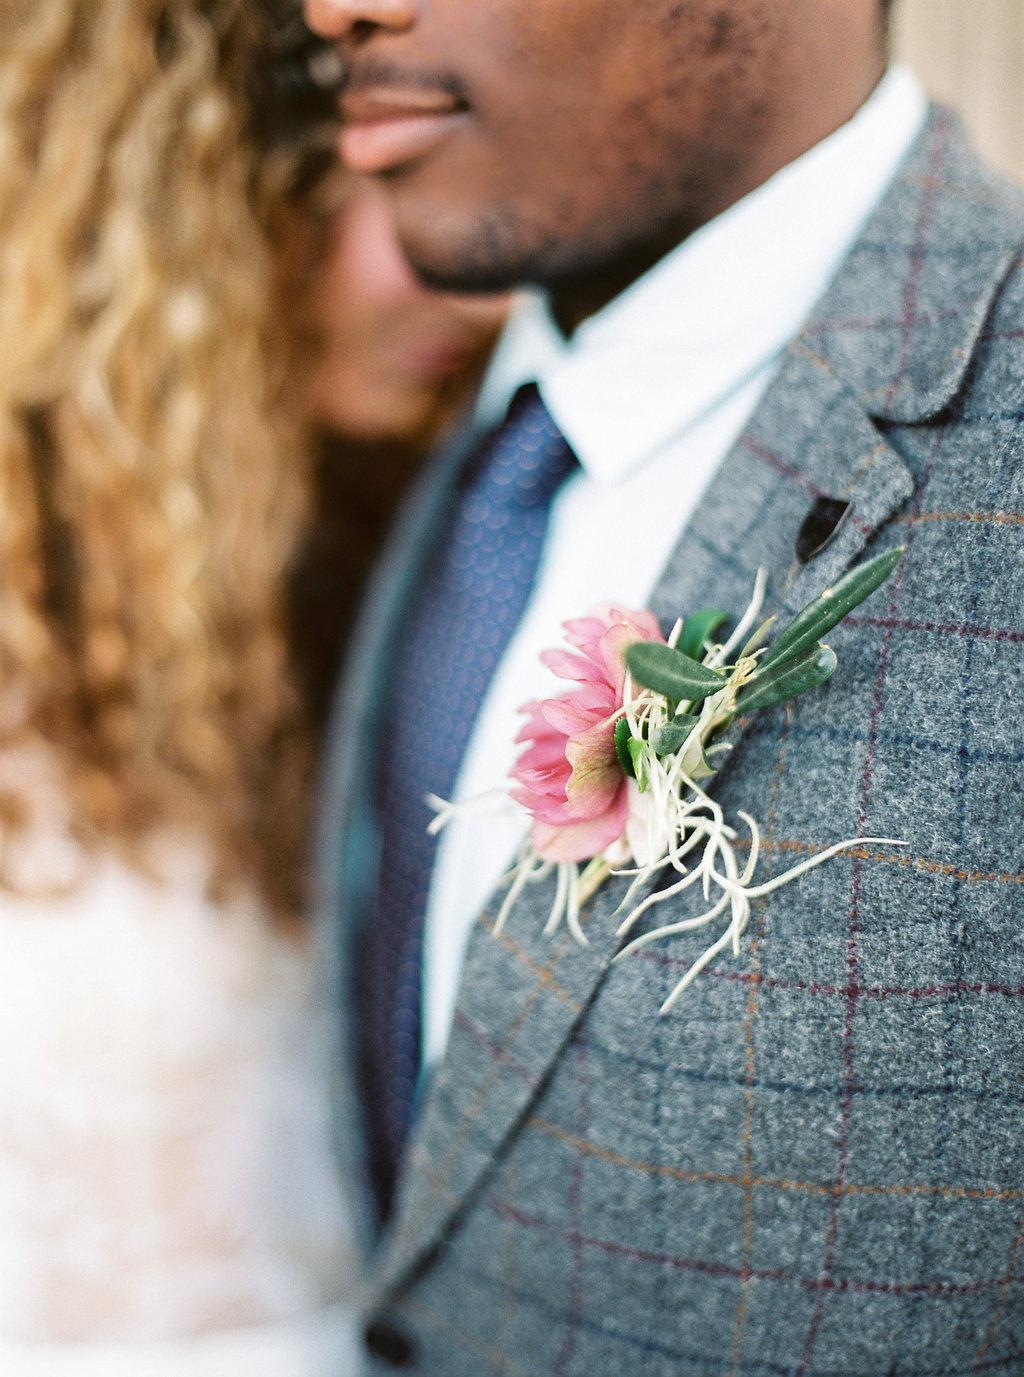 WeddingSparrow-PhotographybyIntoTheLight-Macias-lordan.com-ONLINESHARING(01cof50).jpg